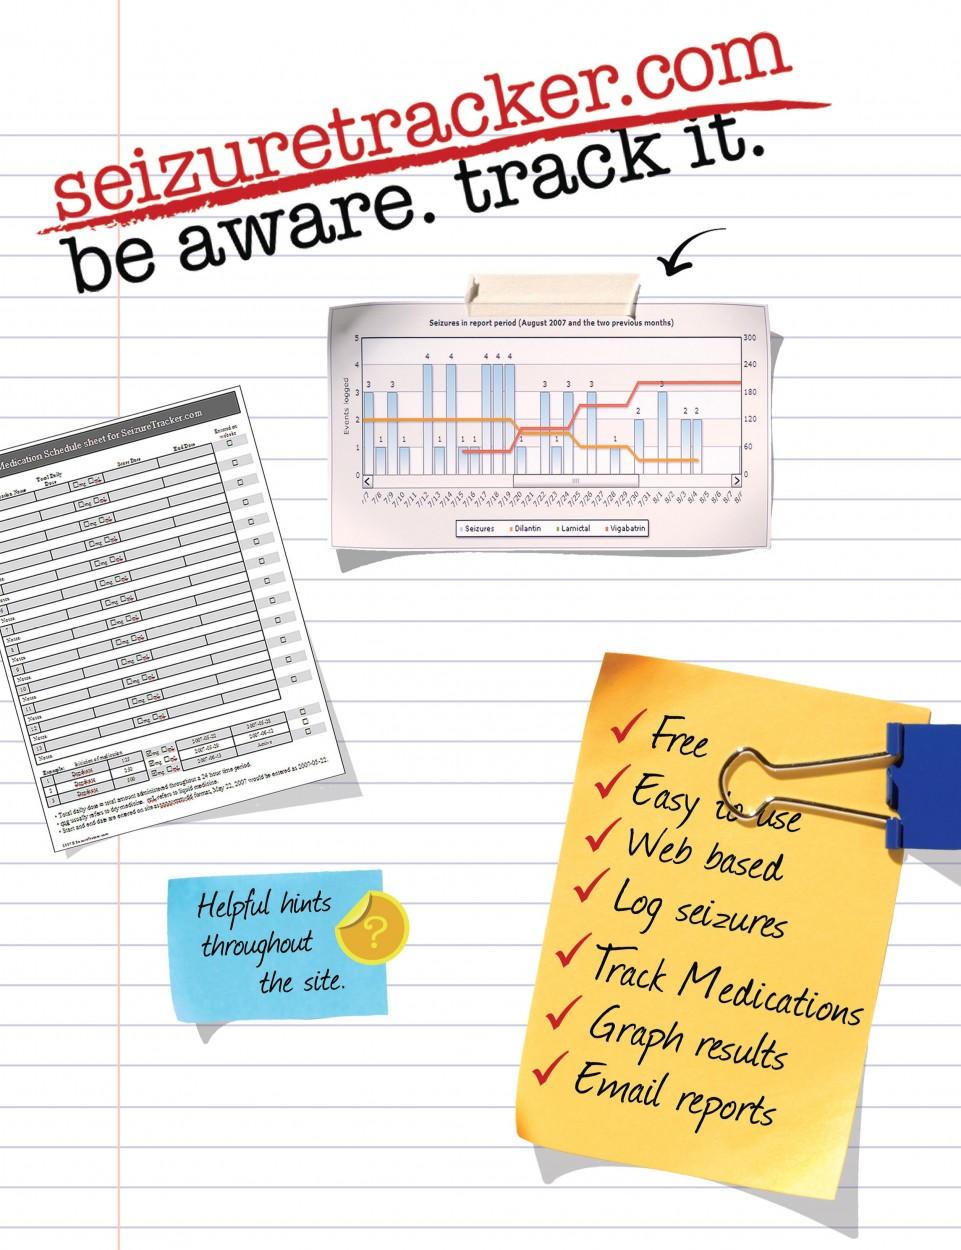 Seizure Tracker App for Special Needs Families